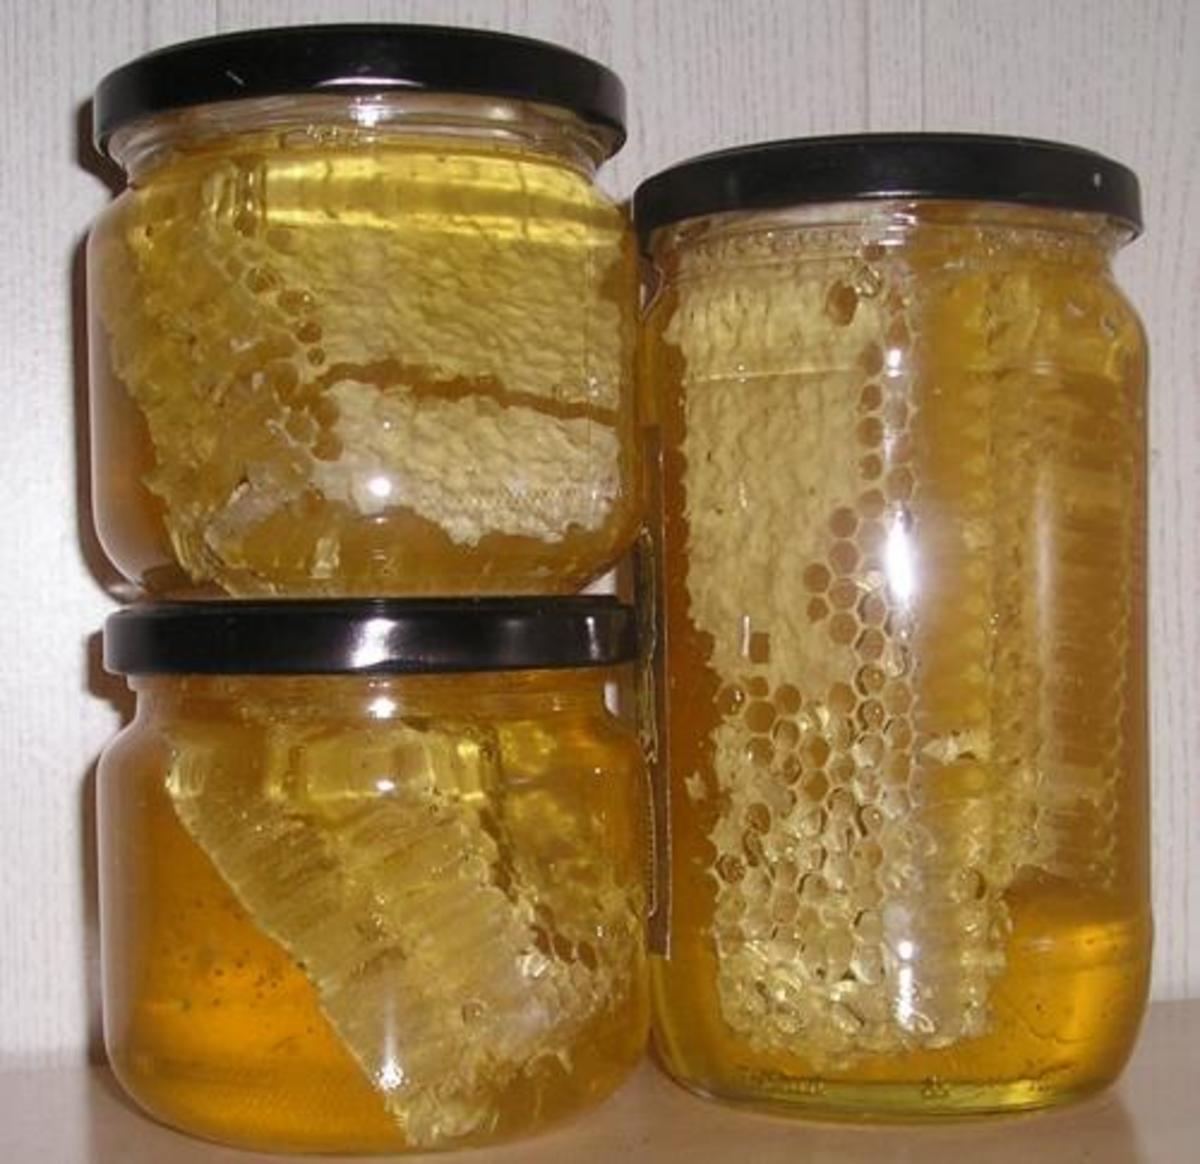 Honey and honey comb